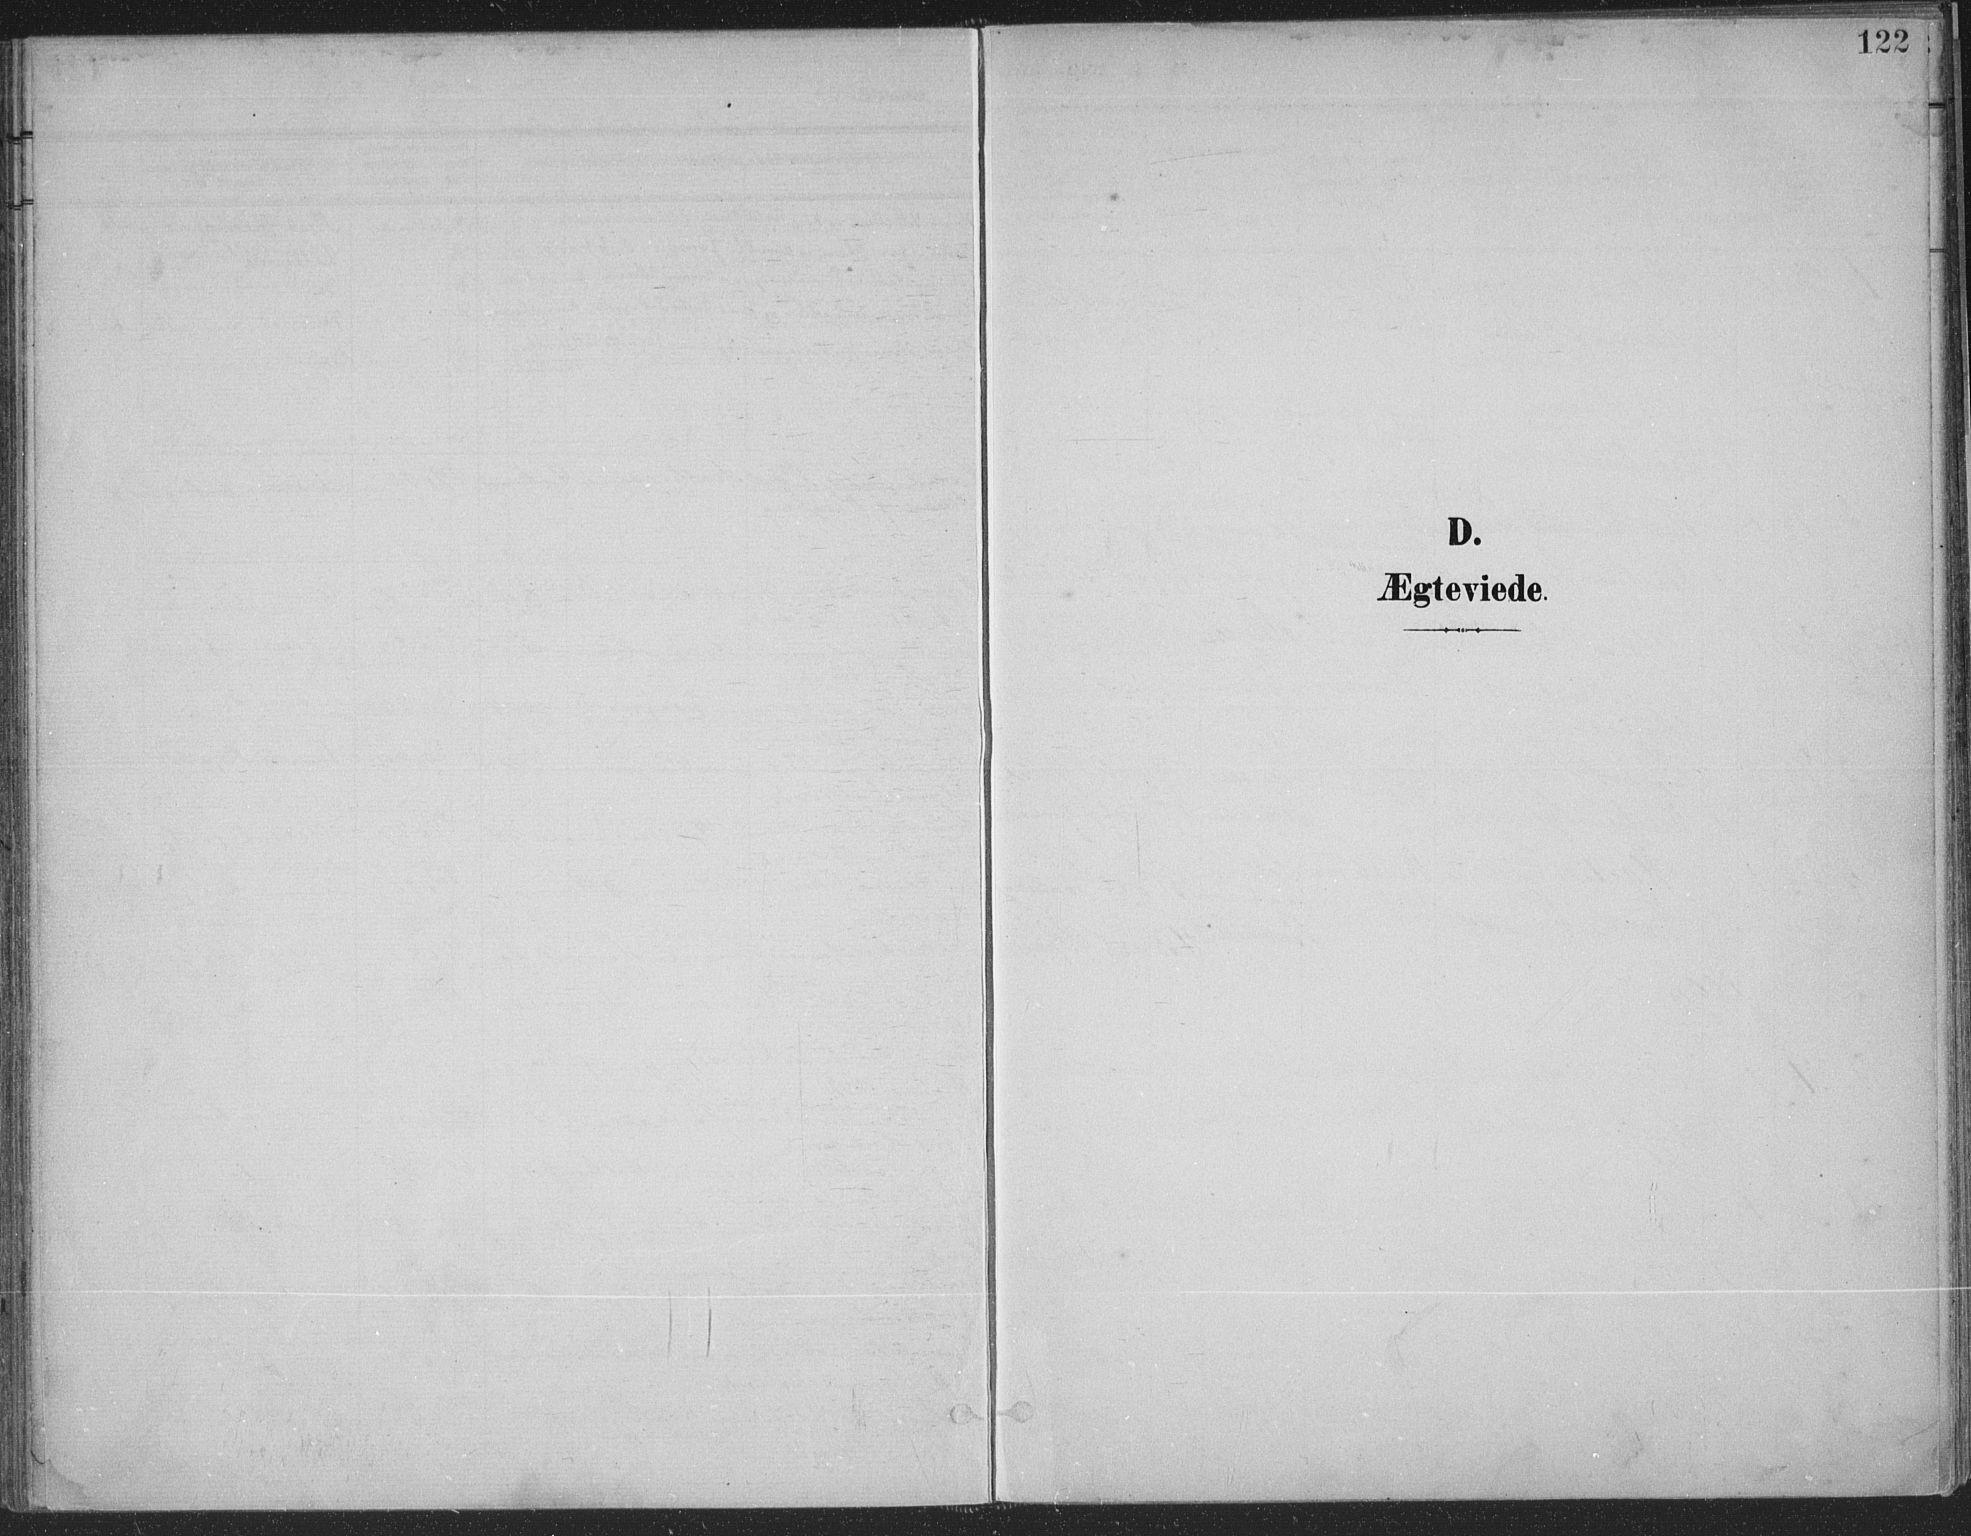 SAH, Østre Gausdal prestekontor, Ministerialbok nr. 4, 1898-1914, s. 122